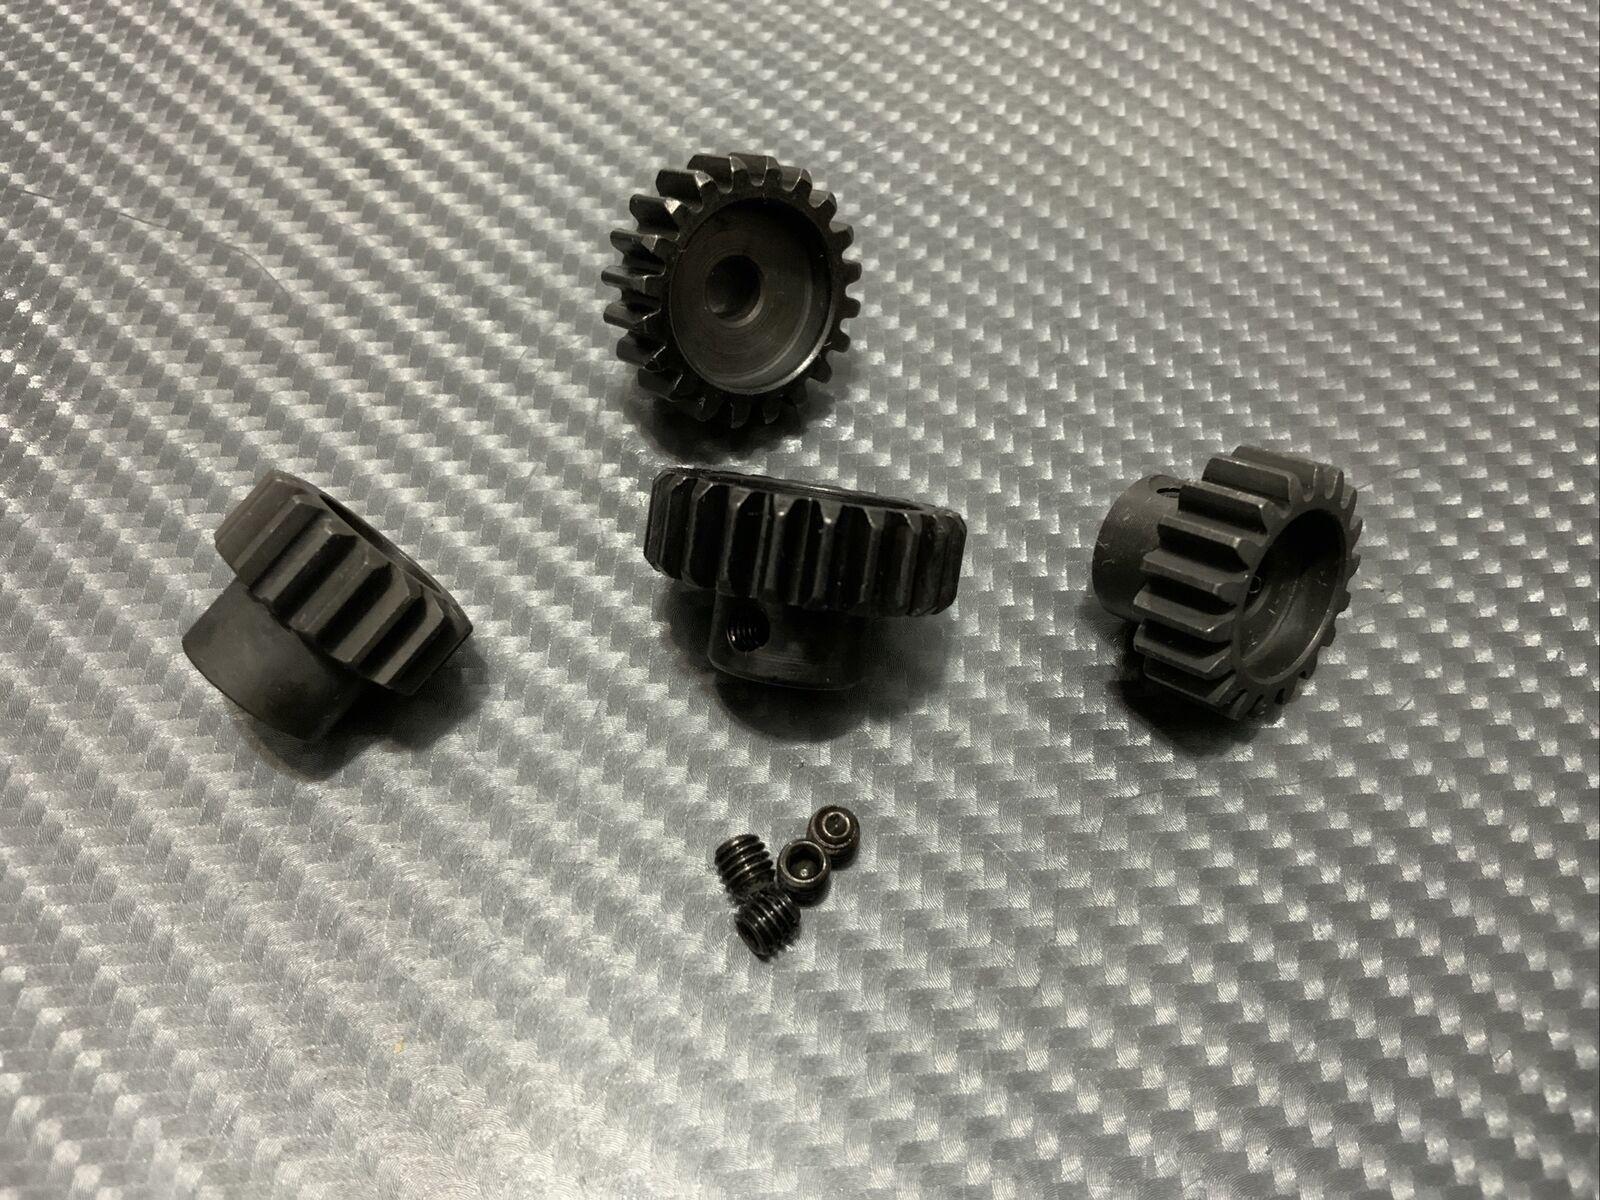 Mod 1 M1 17T 19T 5mm Steel Pinion Gear Fits Spur Castle 2200KV 1515 Motor S//Dent